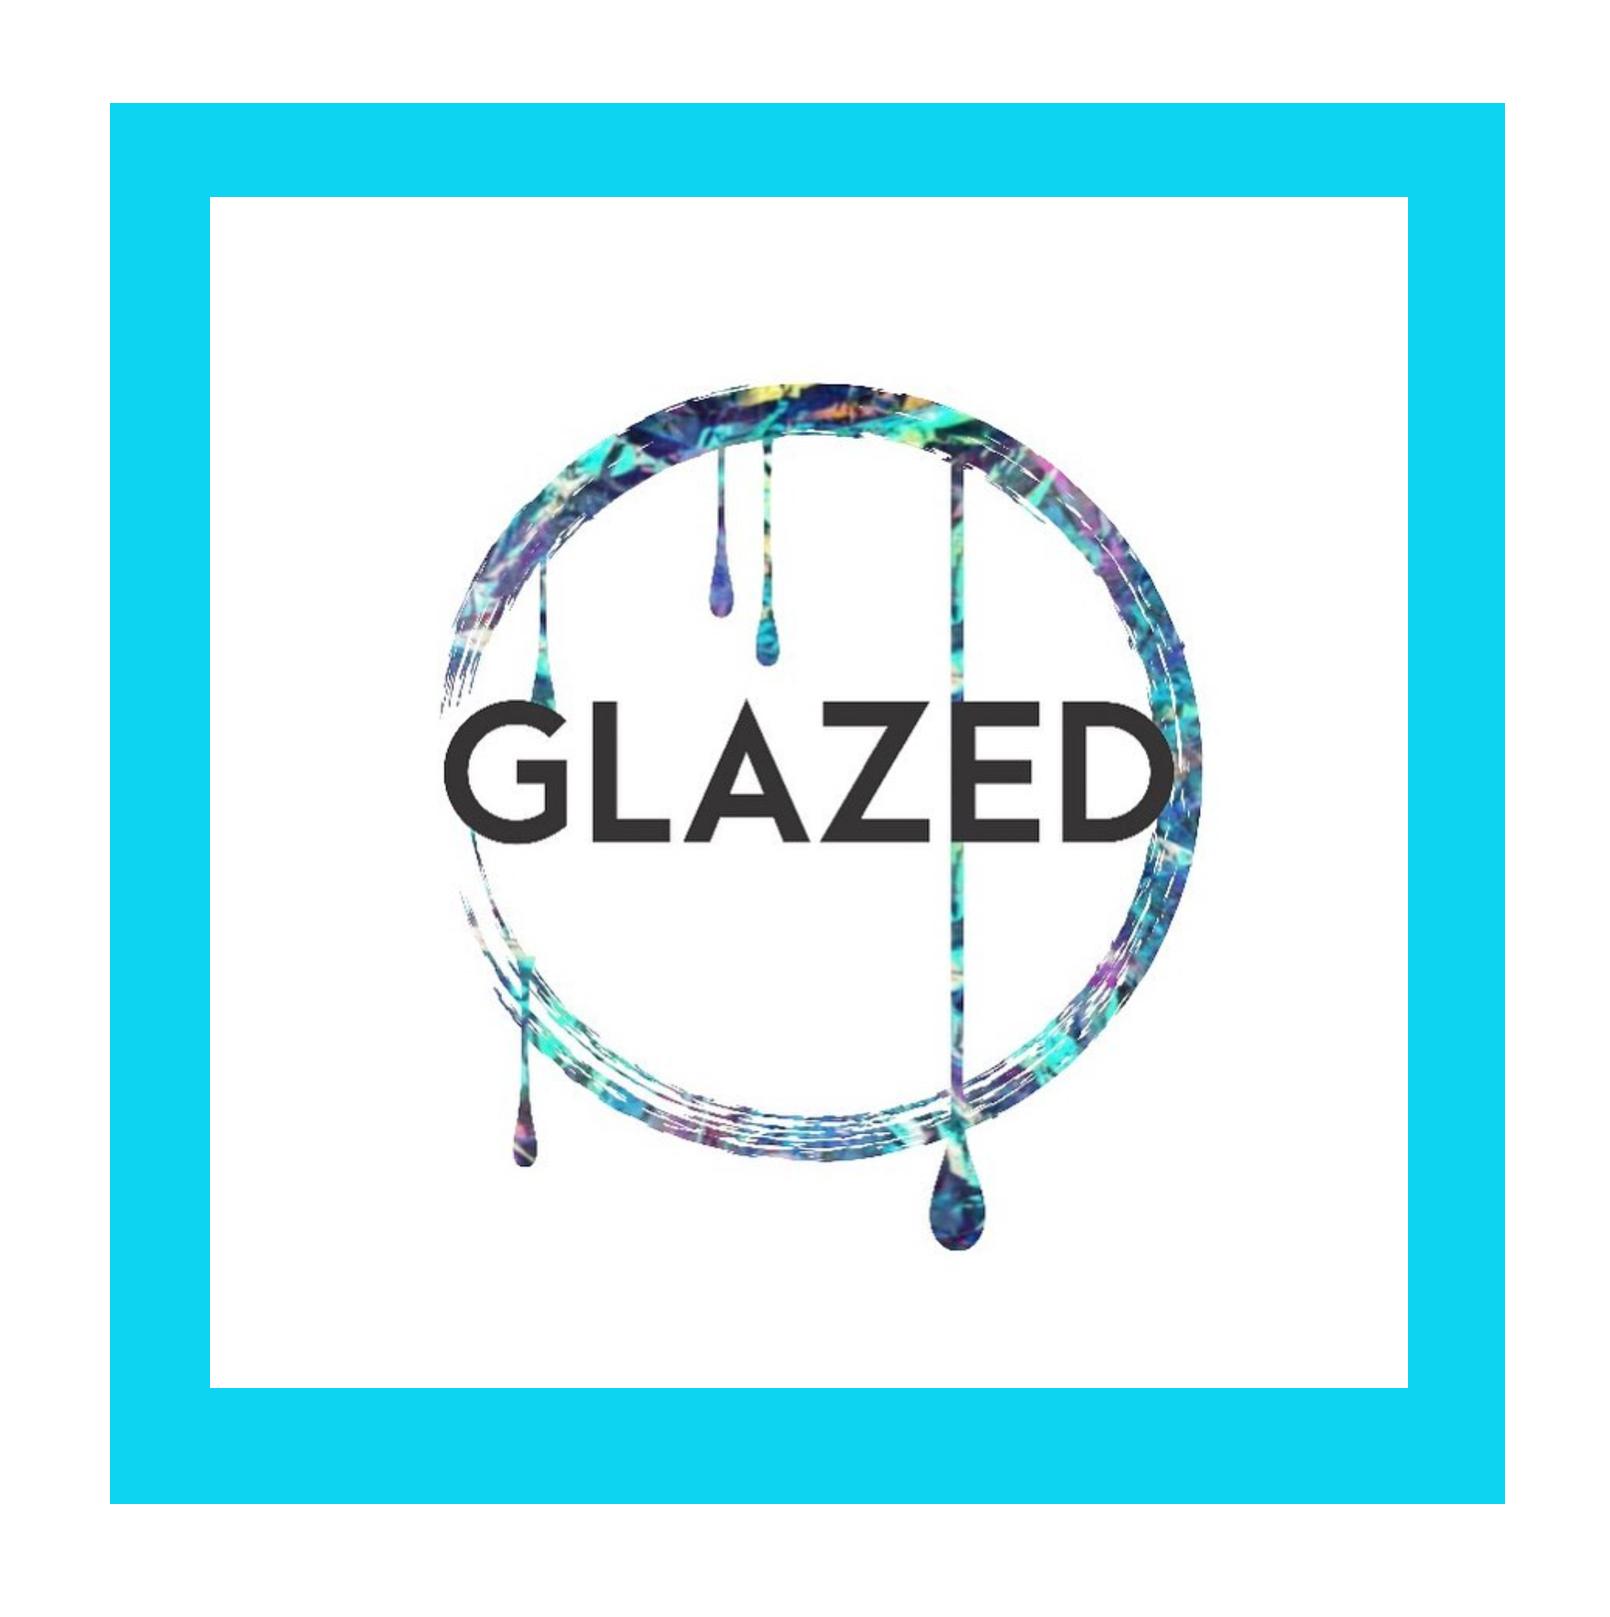 glazed.jpg